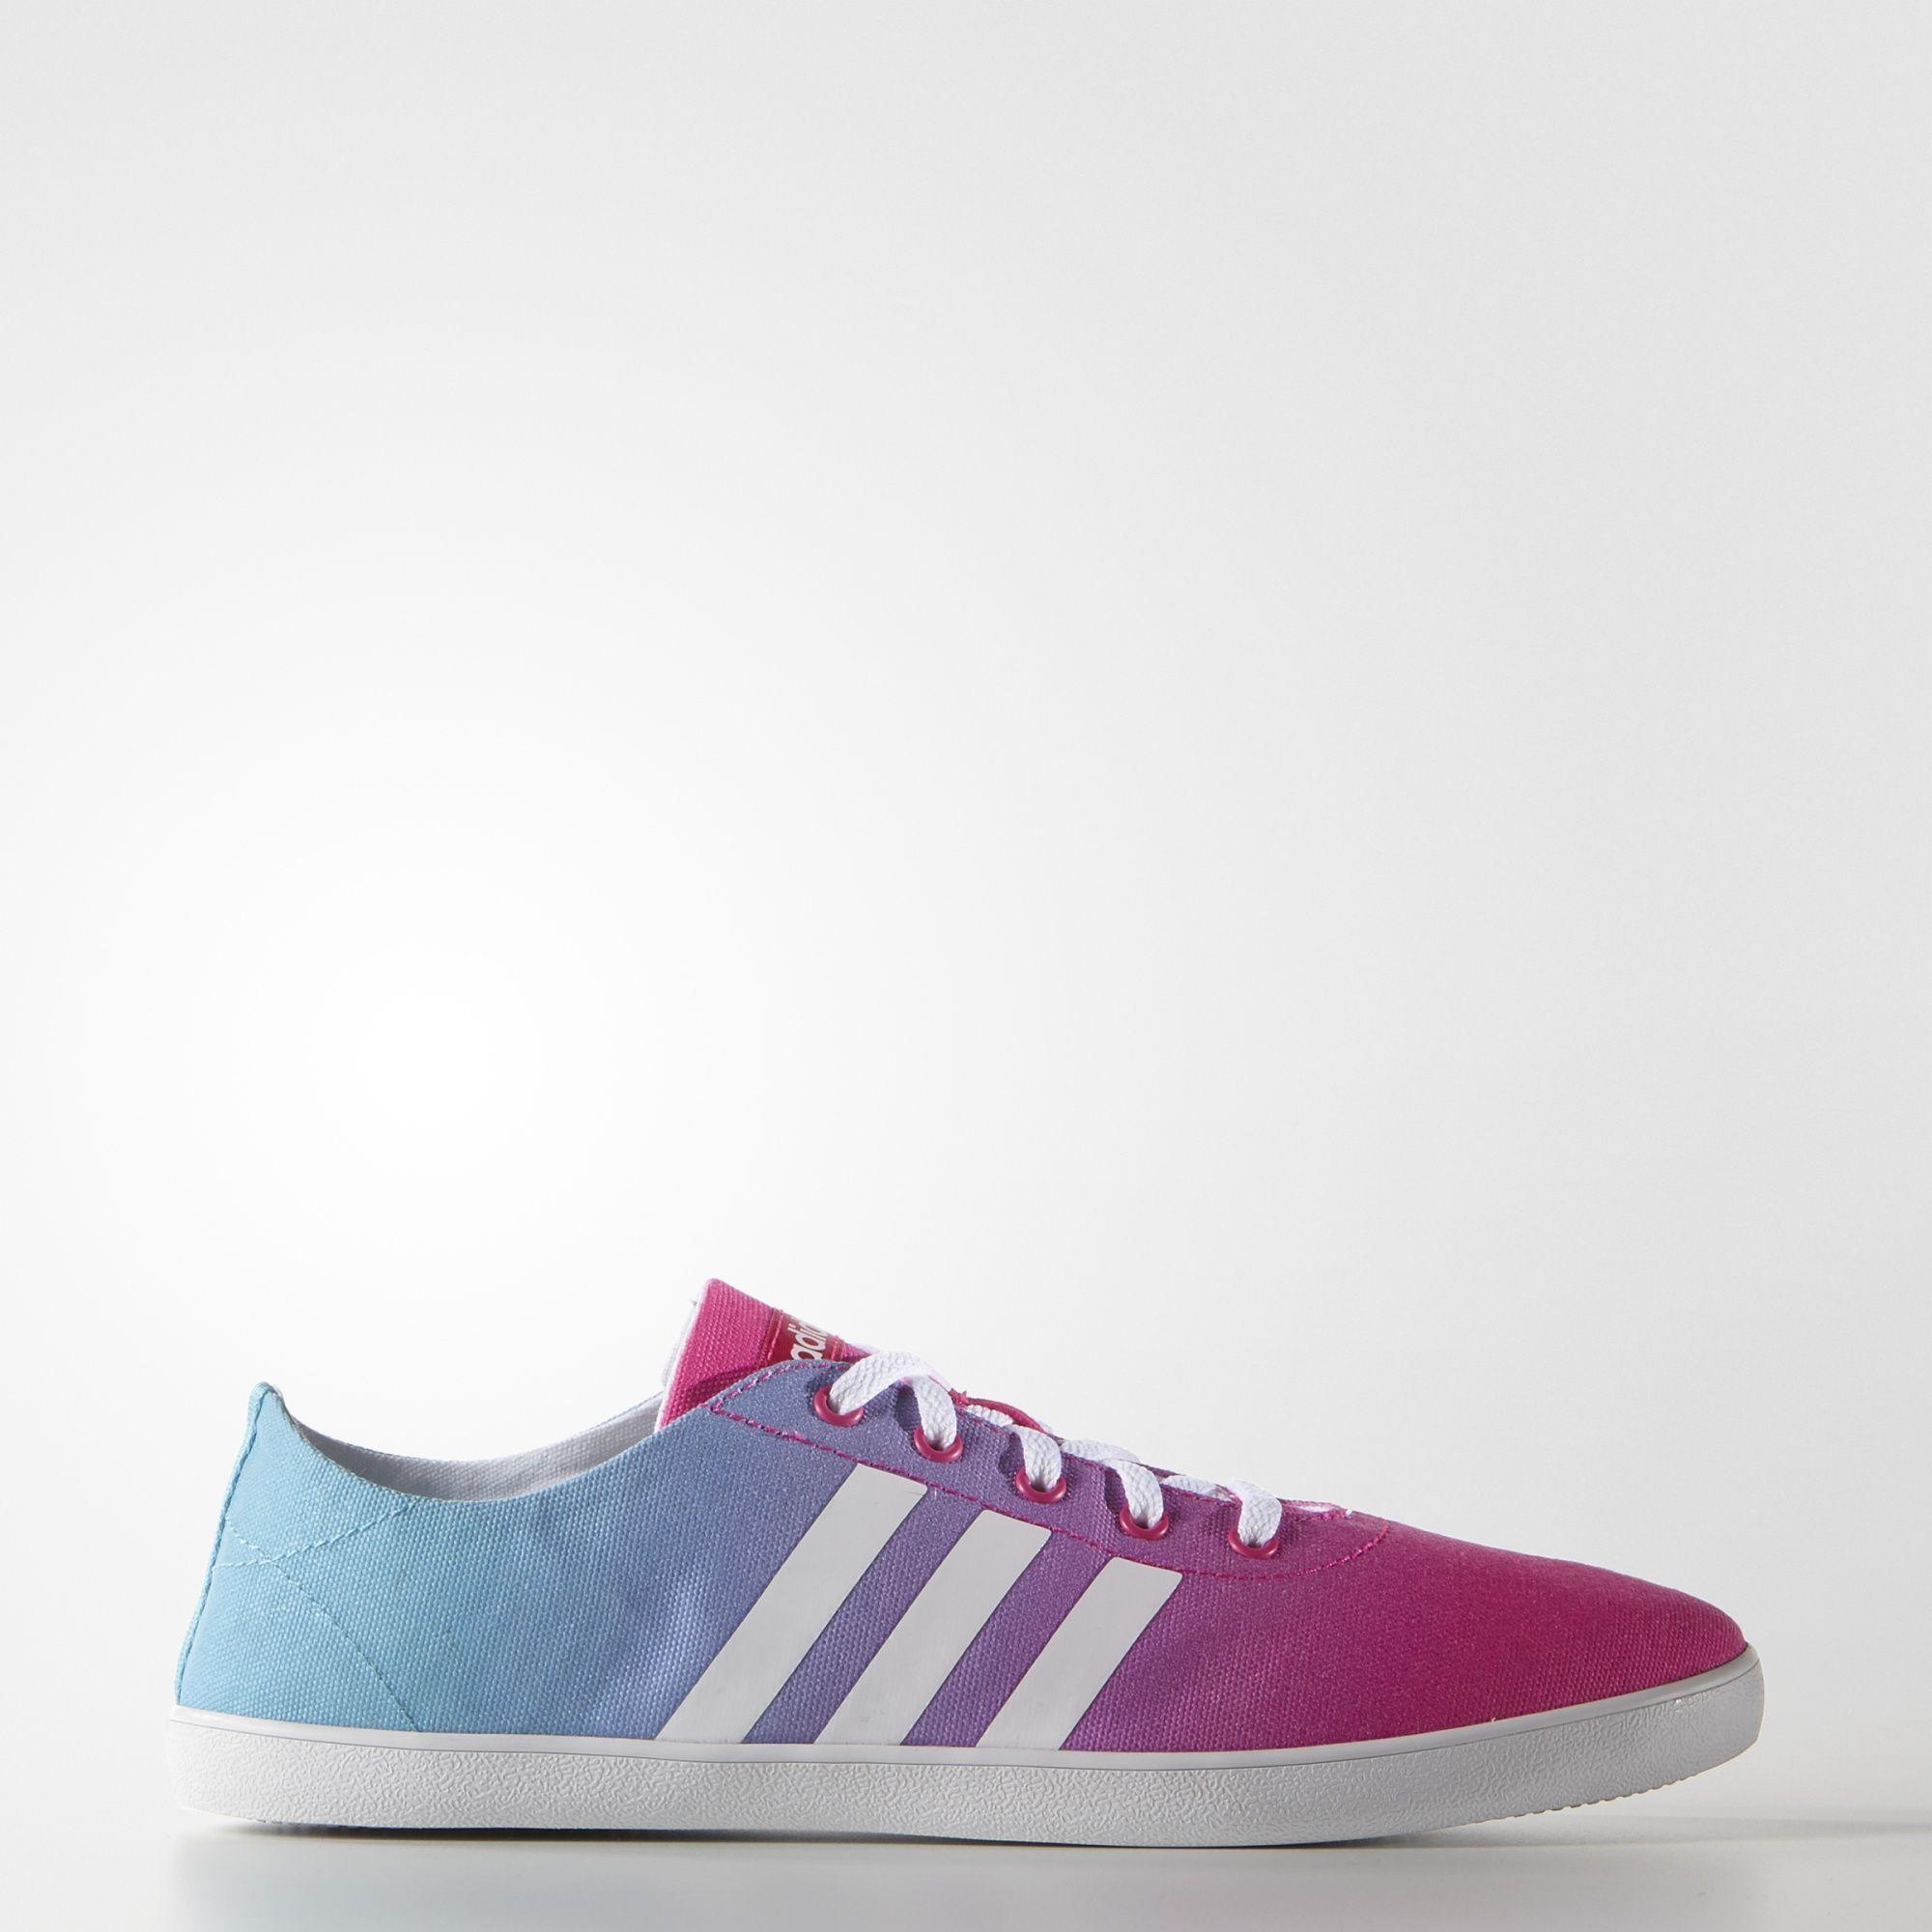 newest 5c8c3 7b862 adidas neo - VS QT Vulc Schuh 44,95 EUR